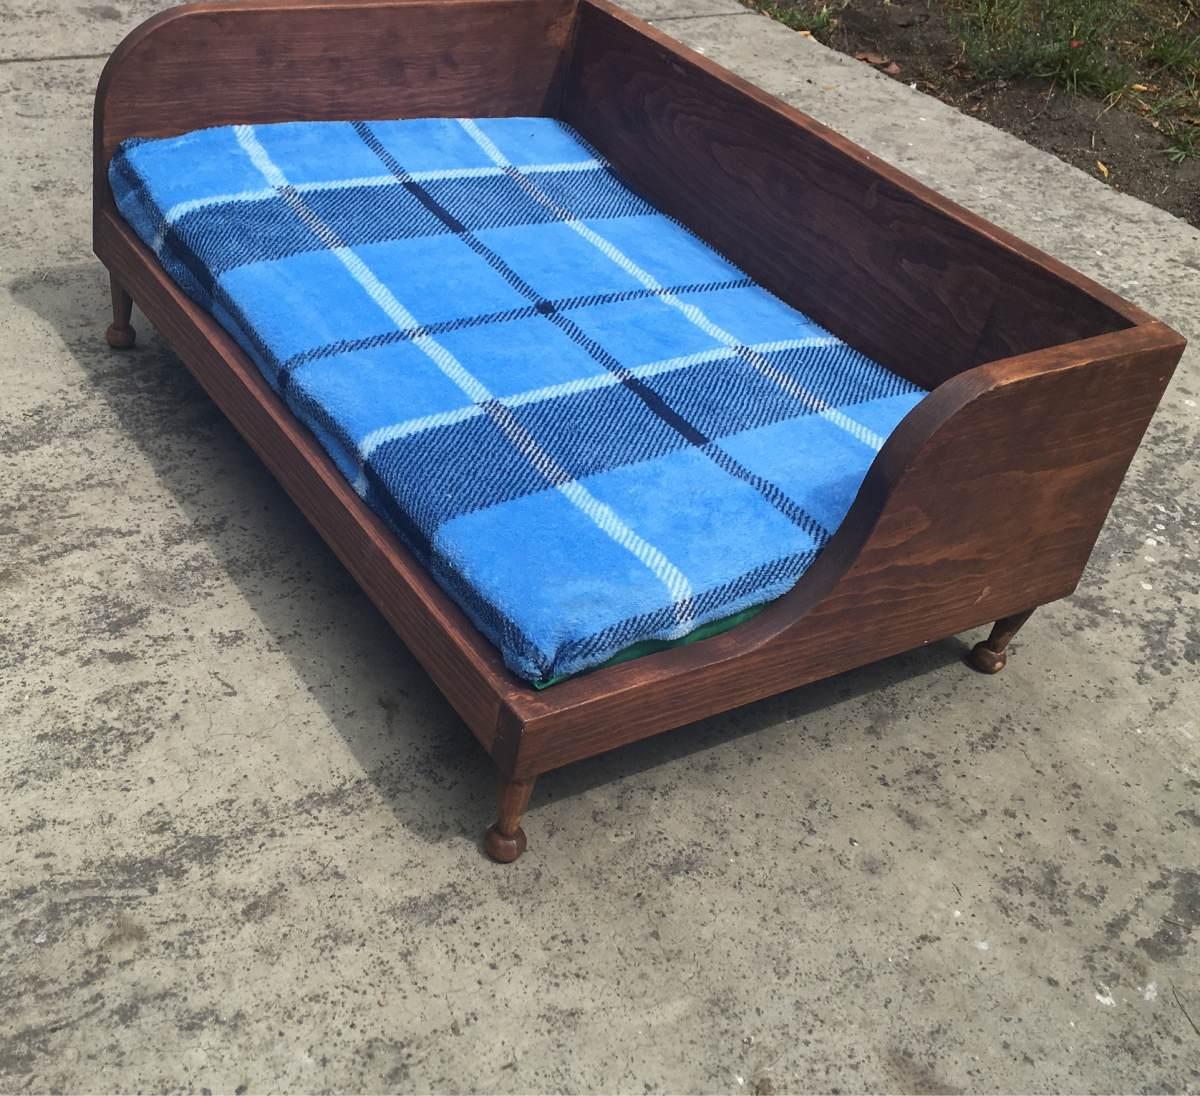 camas de madera para perros 1 en mercado libre